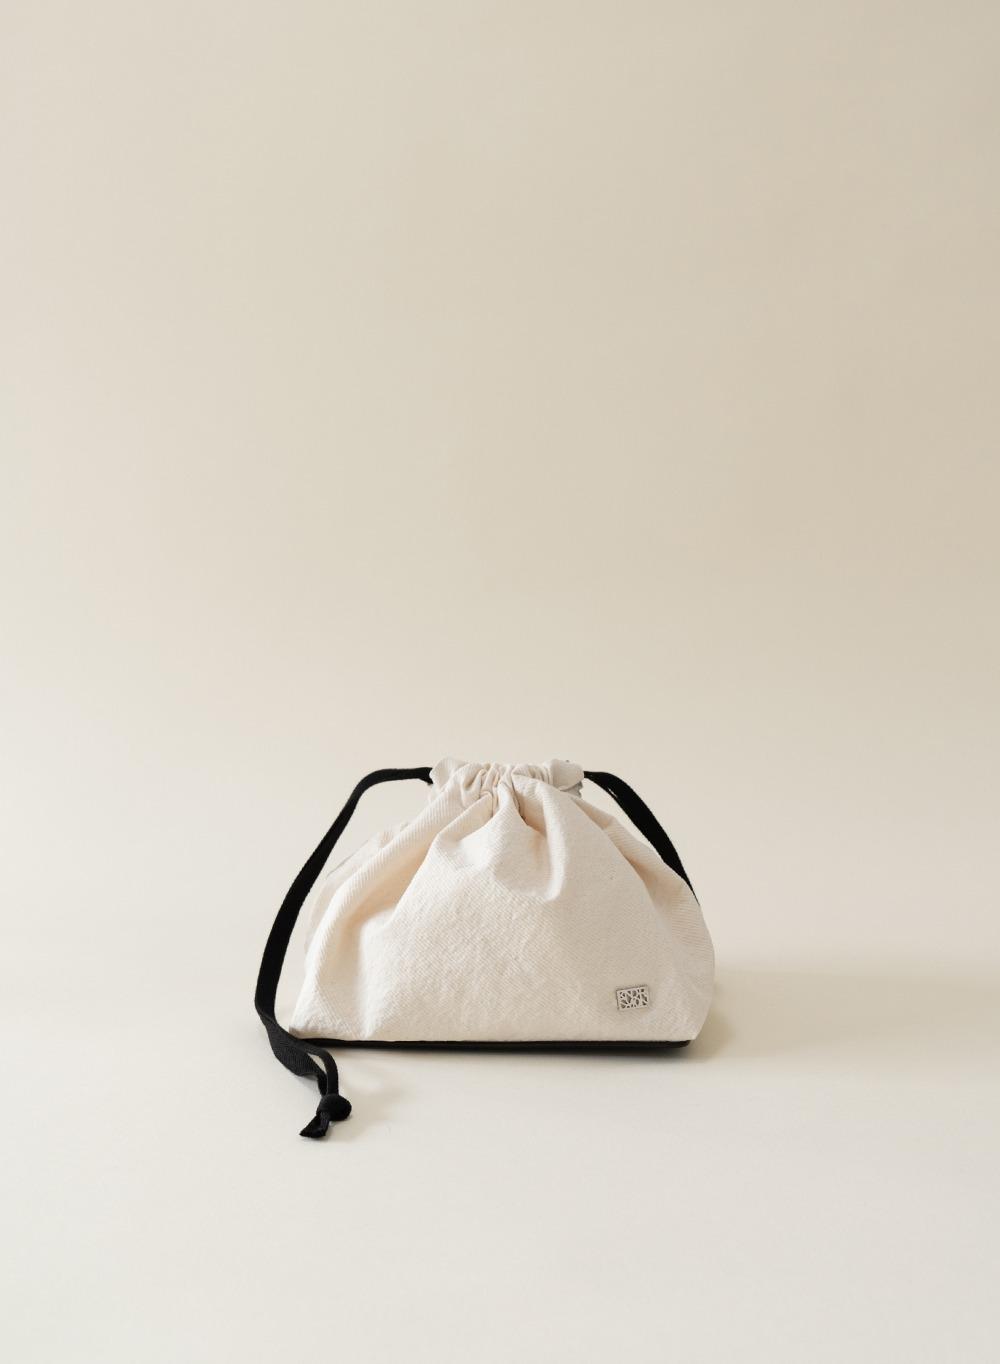 [ESSENTIAL] Cotton Pouch Ecru